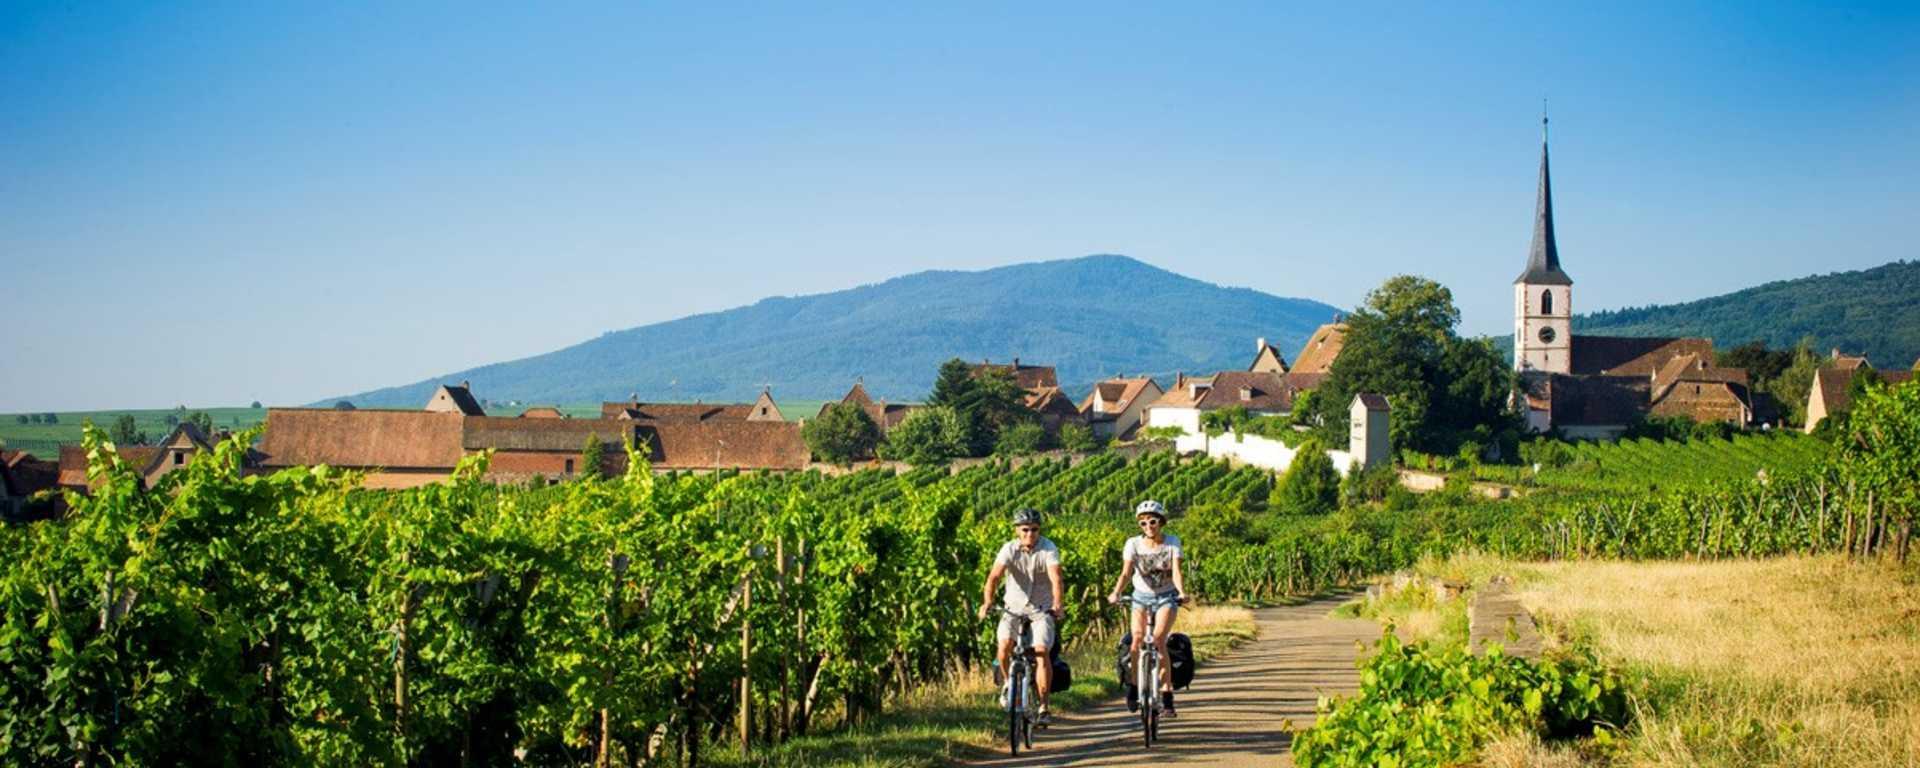 Cartes interactives des itinéraires cyclables en Alsace